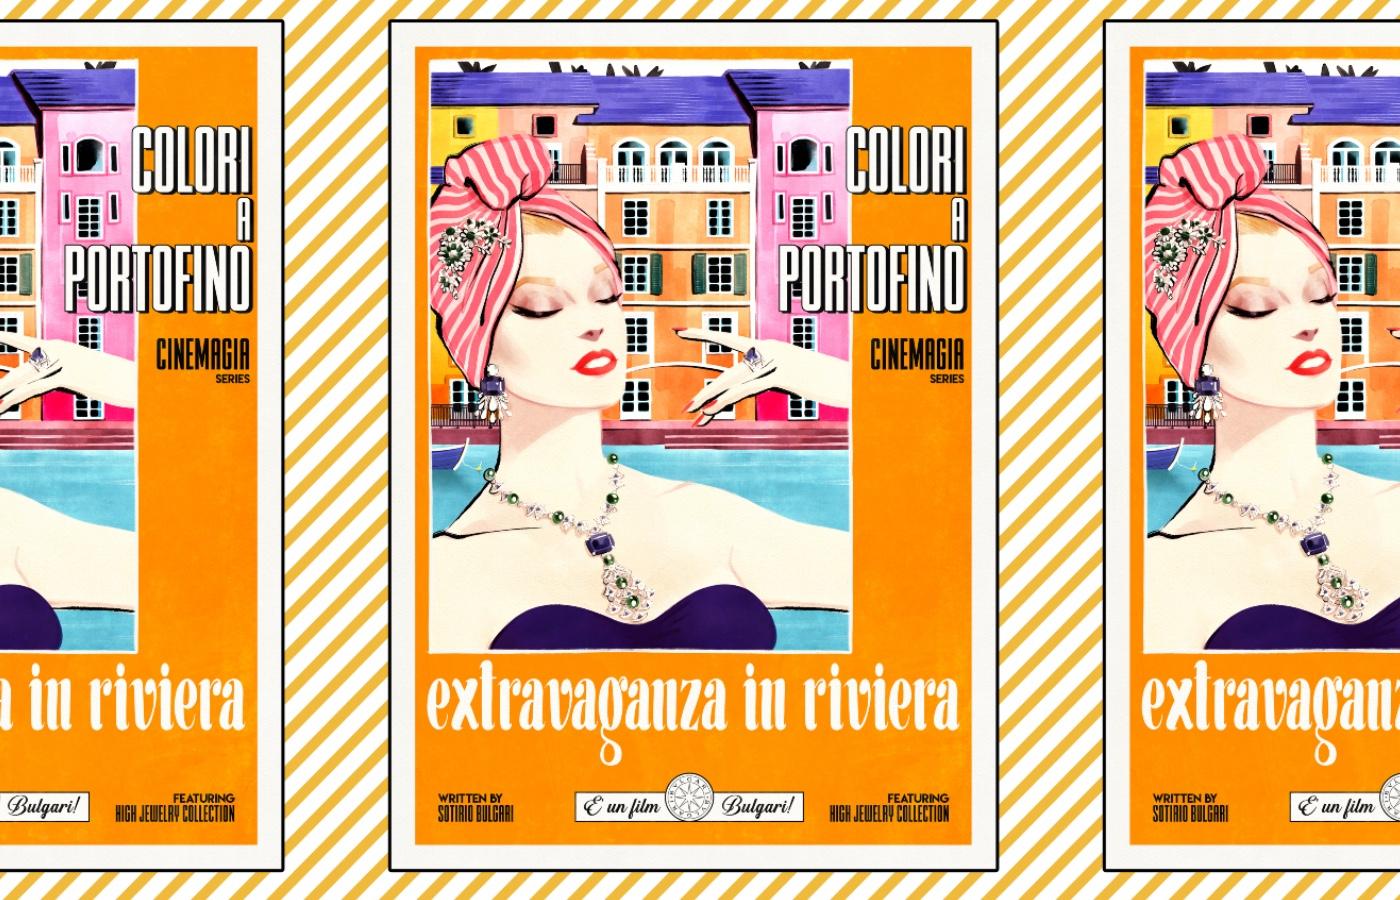 d3a28422a05e4 Bulgari presents Cinemania Pop-up in Selfridges – The Glass Magazine